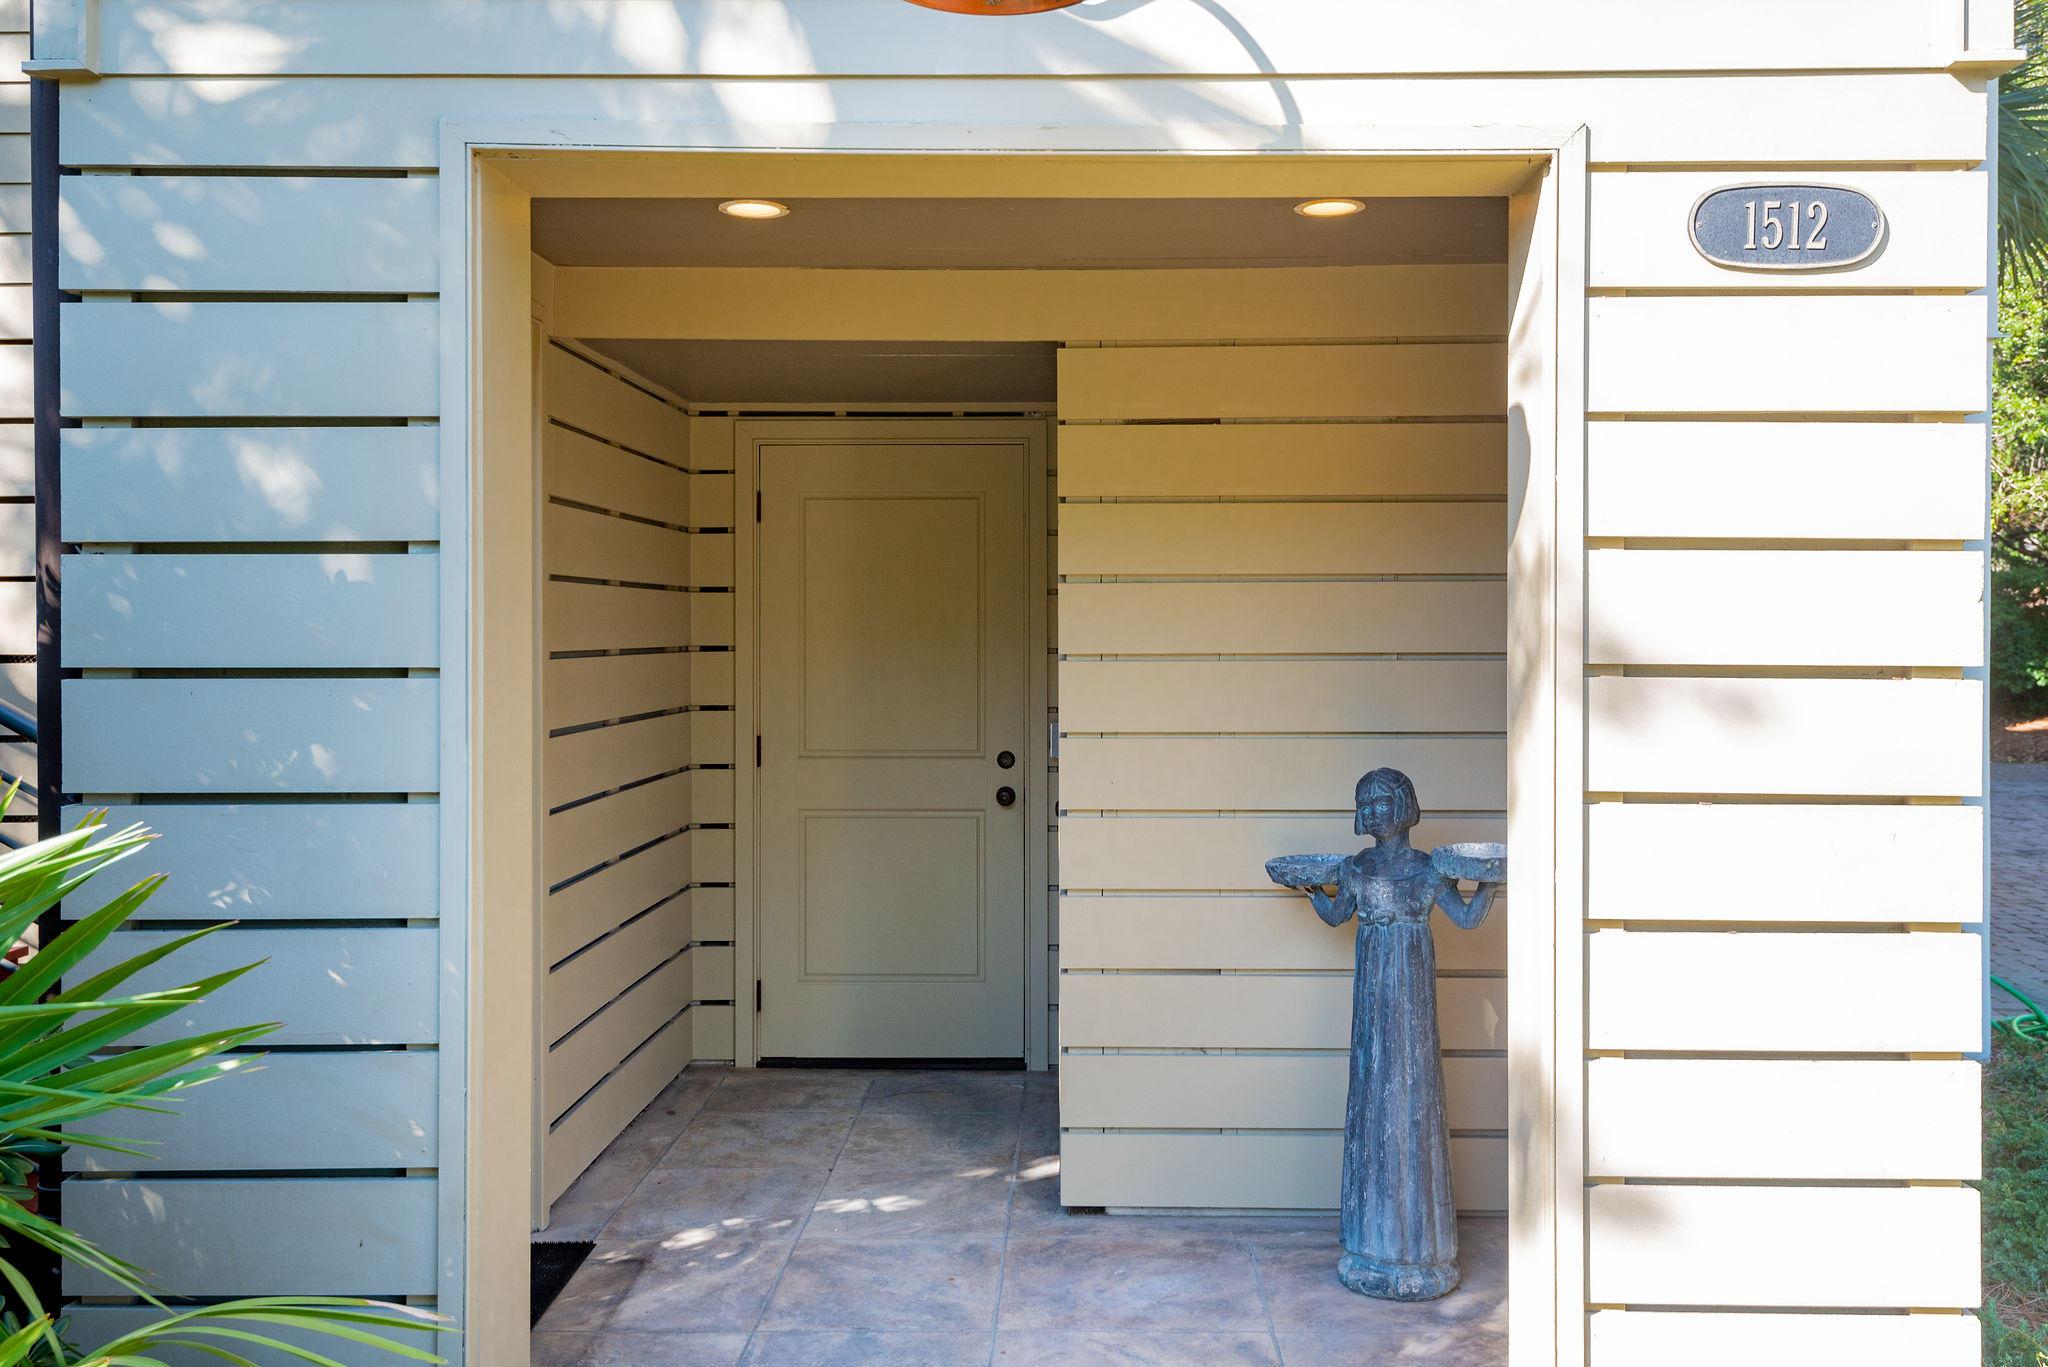 Sullivans Island Homes For Sale - 1512 Poe, Sullivans Island, SC - 29